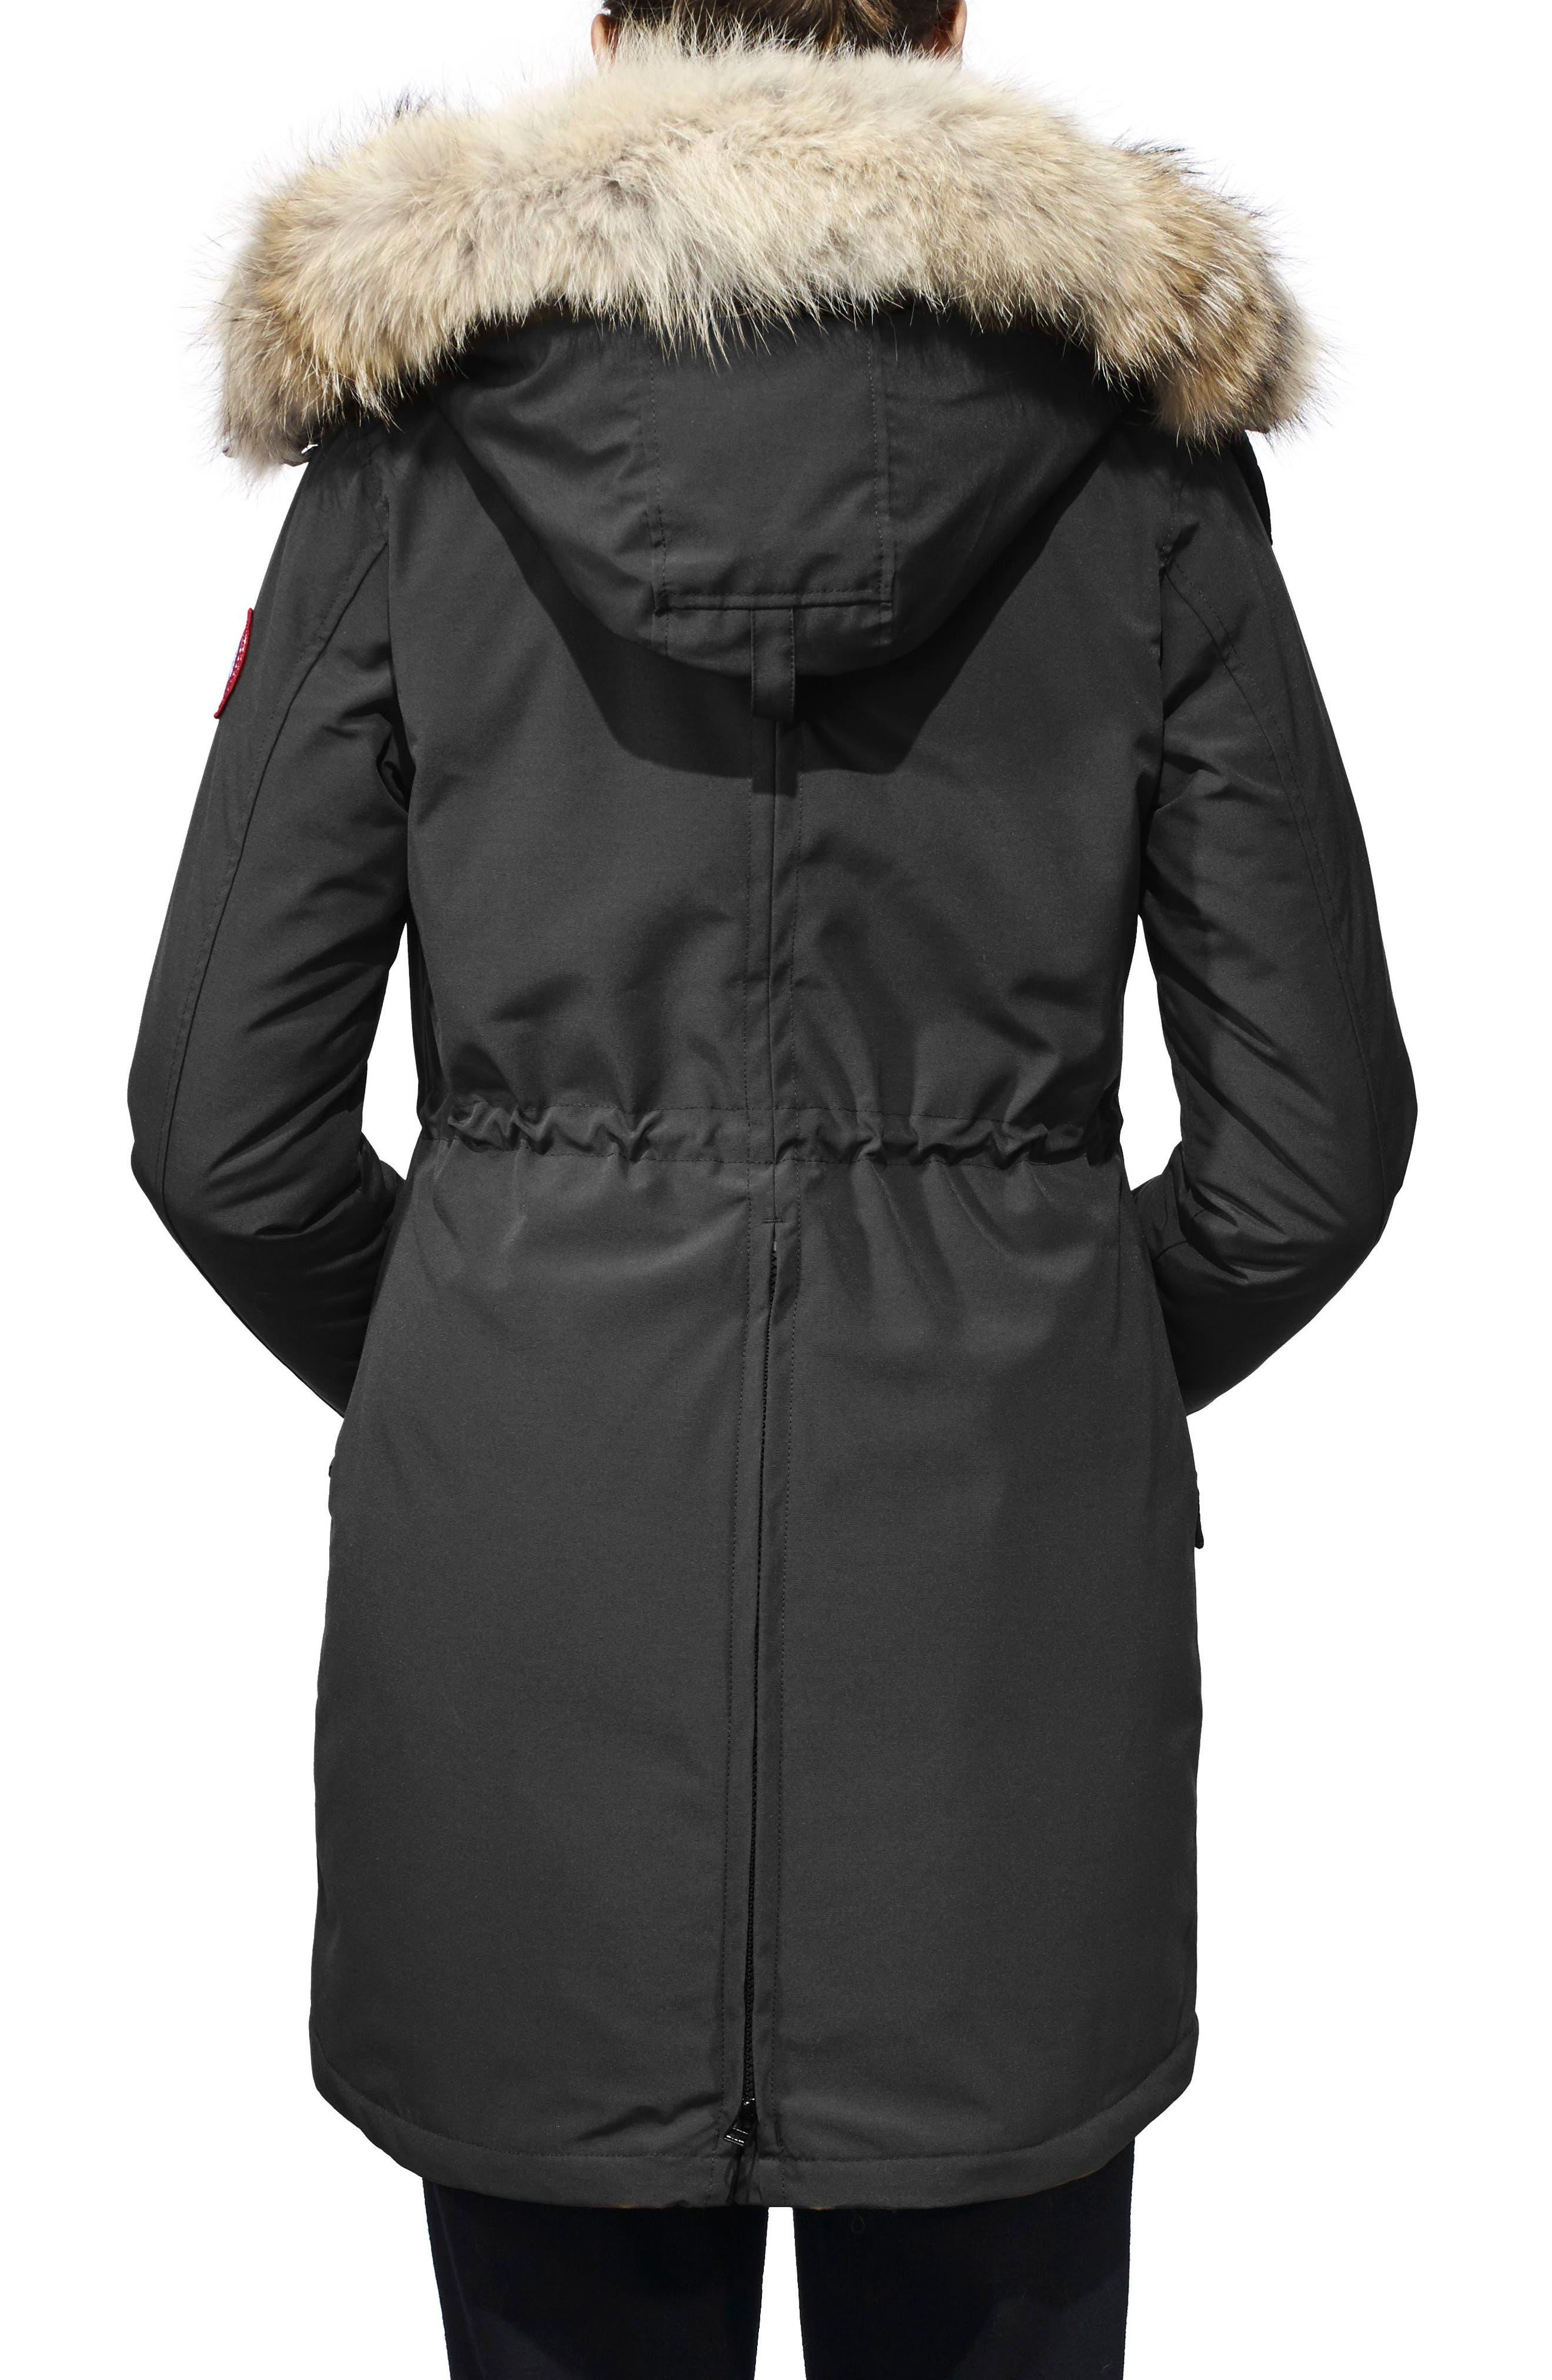 0905a851 Women's Fleece Petite Clothing | Nordstrom